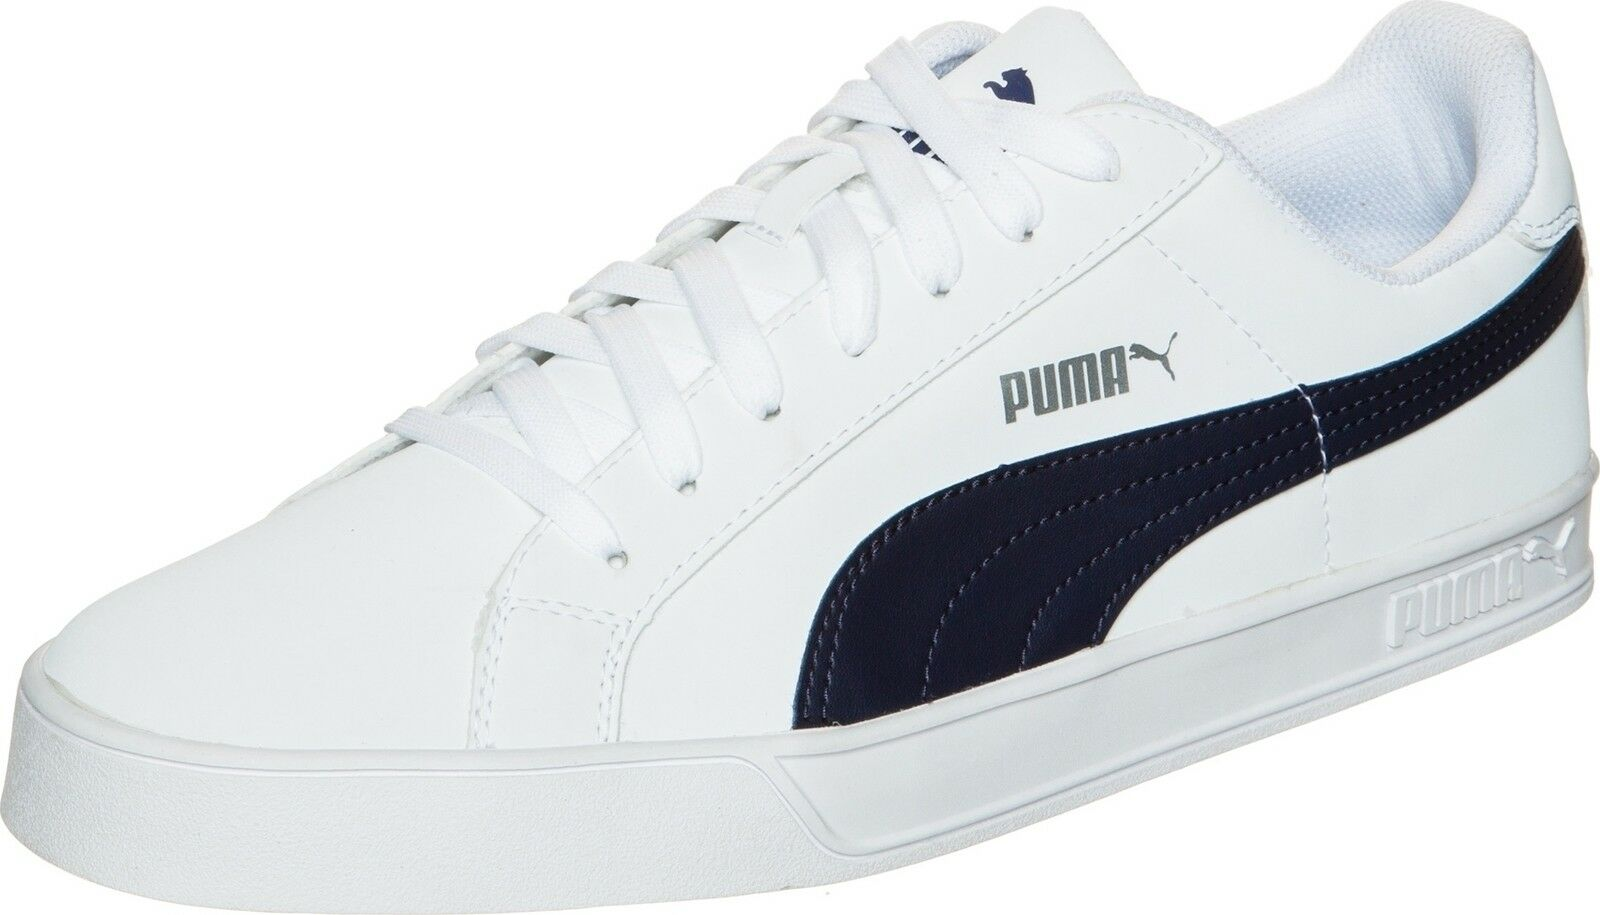 PUMA  Herren Smash Vulc Weiß Leder Trainers Schuhes 359622-10 Weiß Vulc / Peacoat d83ba8